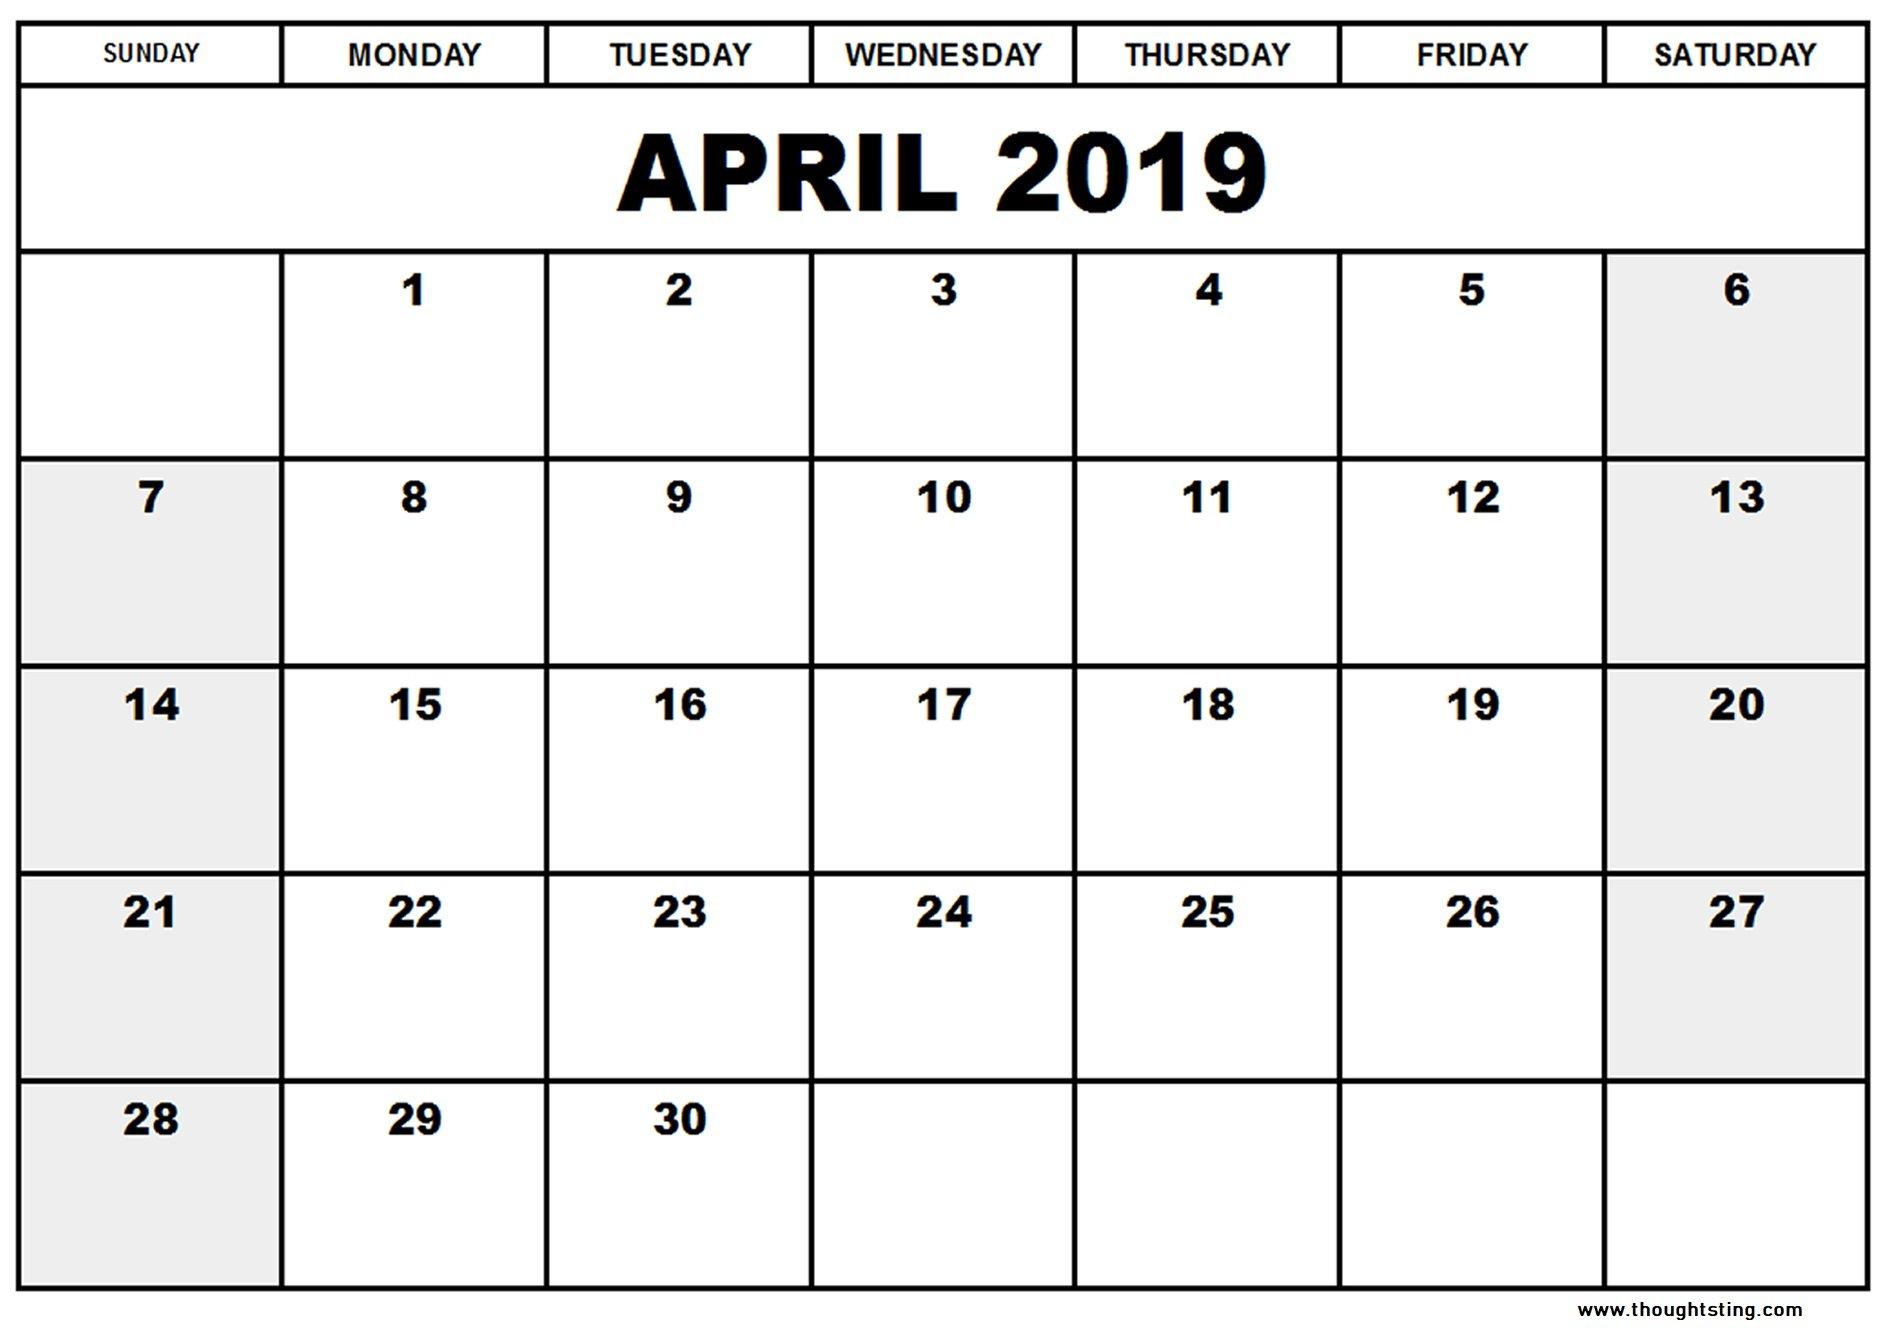 April 2019 Calendar Template Word, Excel, Pdf – Free Printable Calendar 2019 In Word